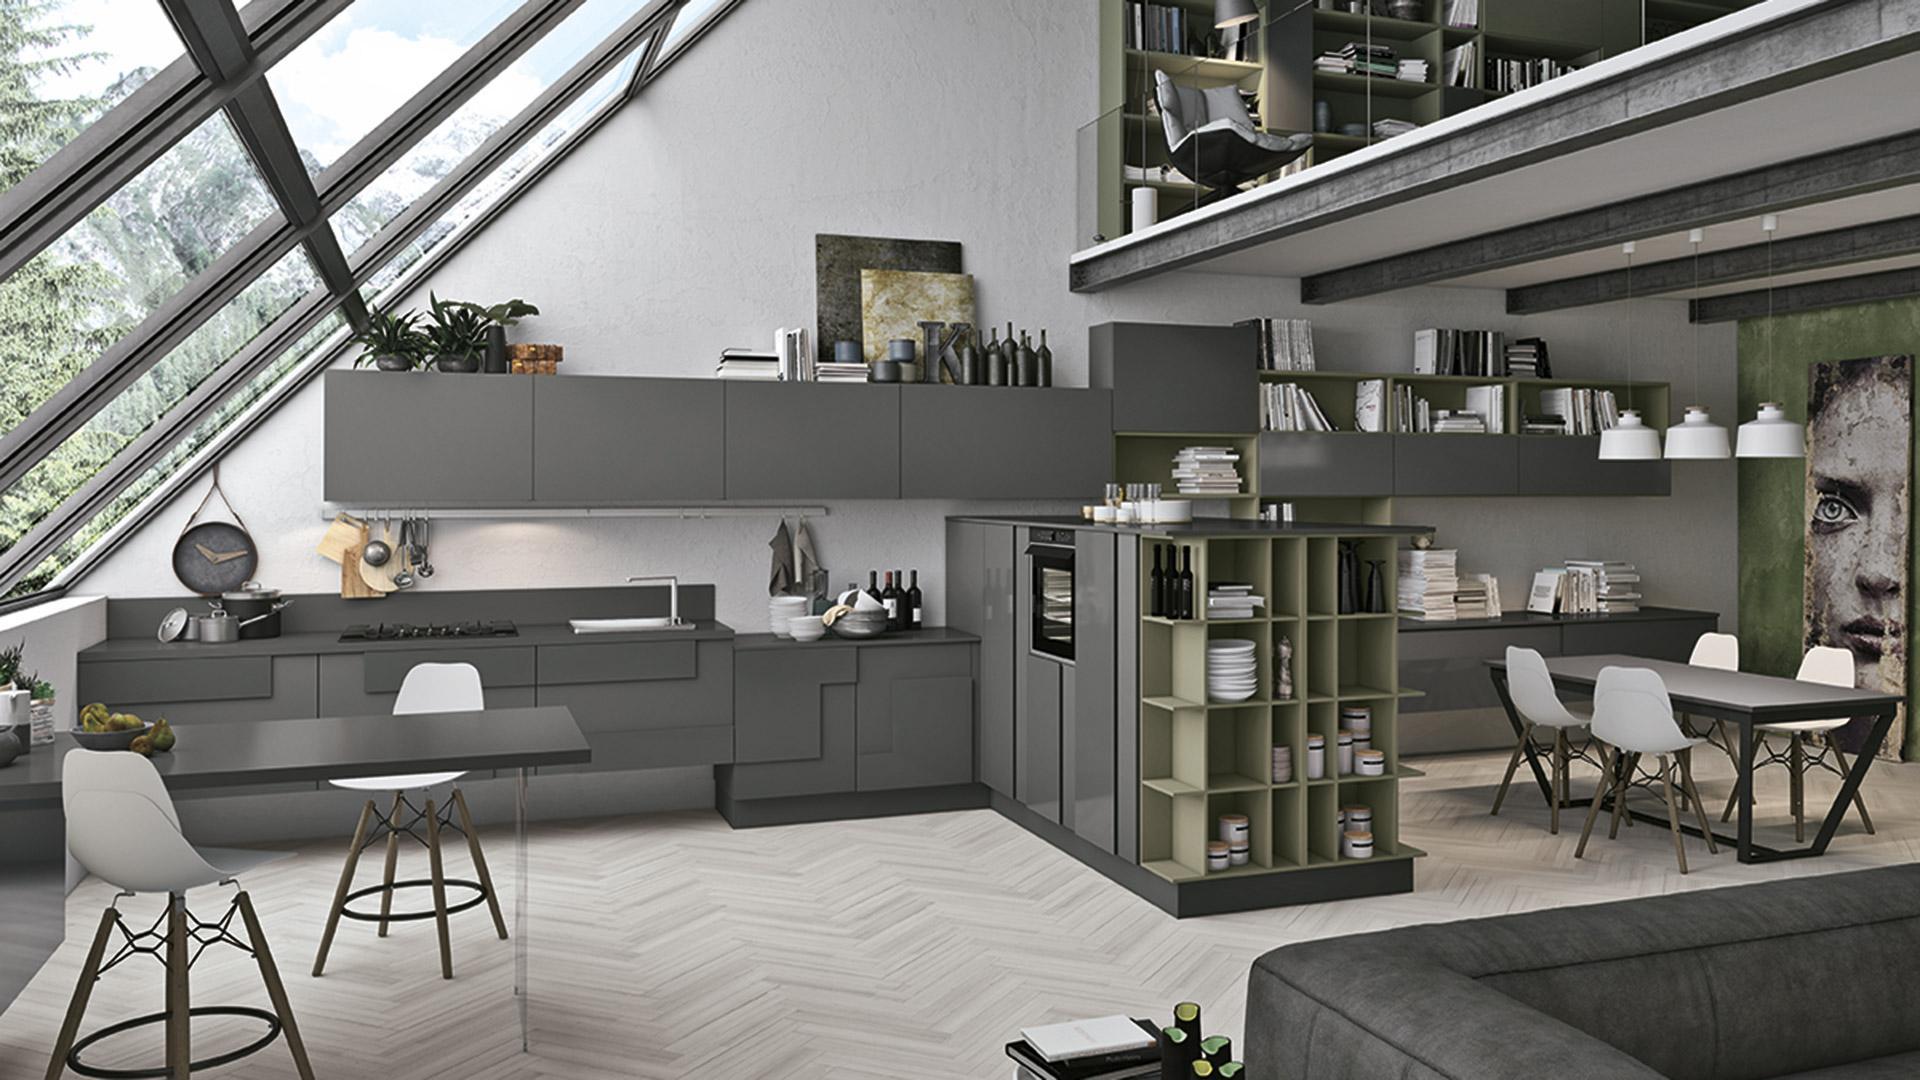 Cucina open space le soluzioni di lube store per unire cucina e